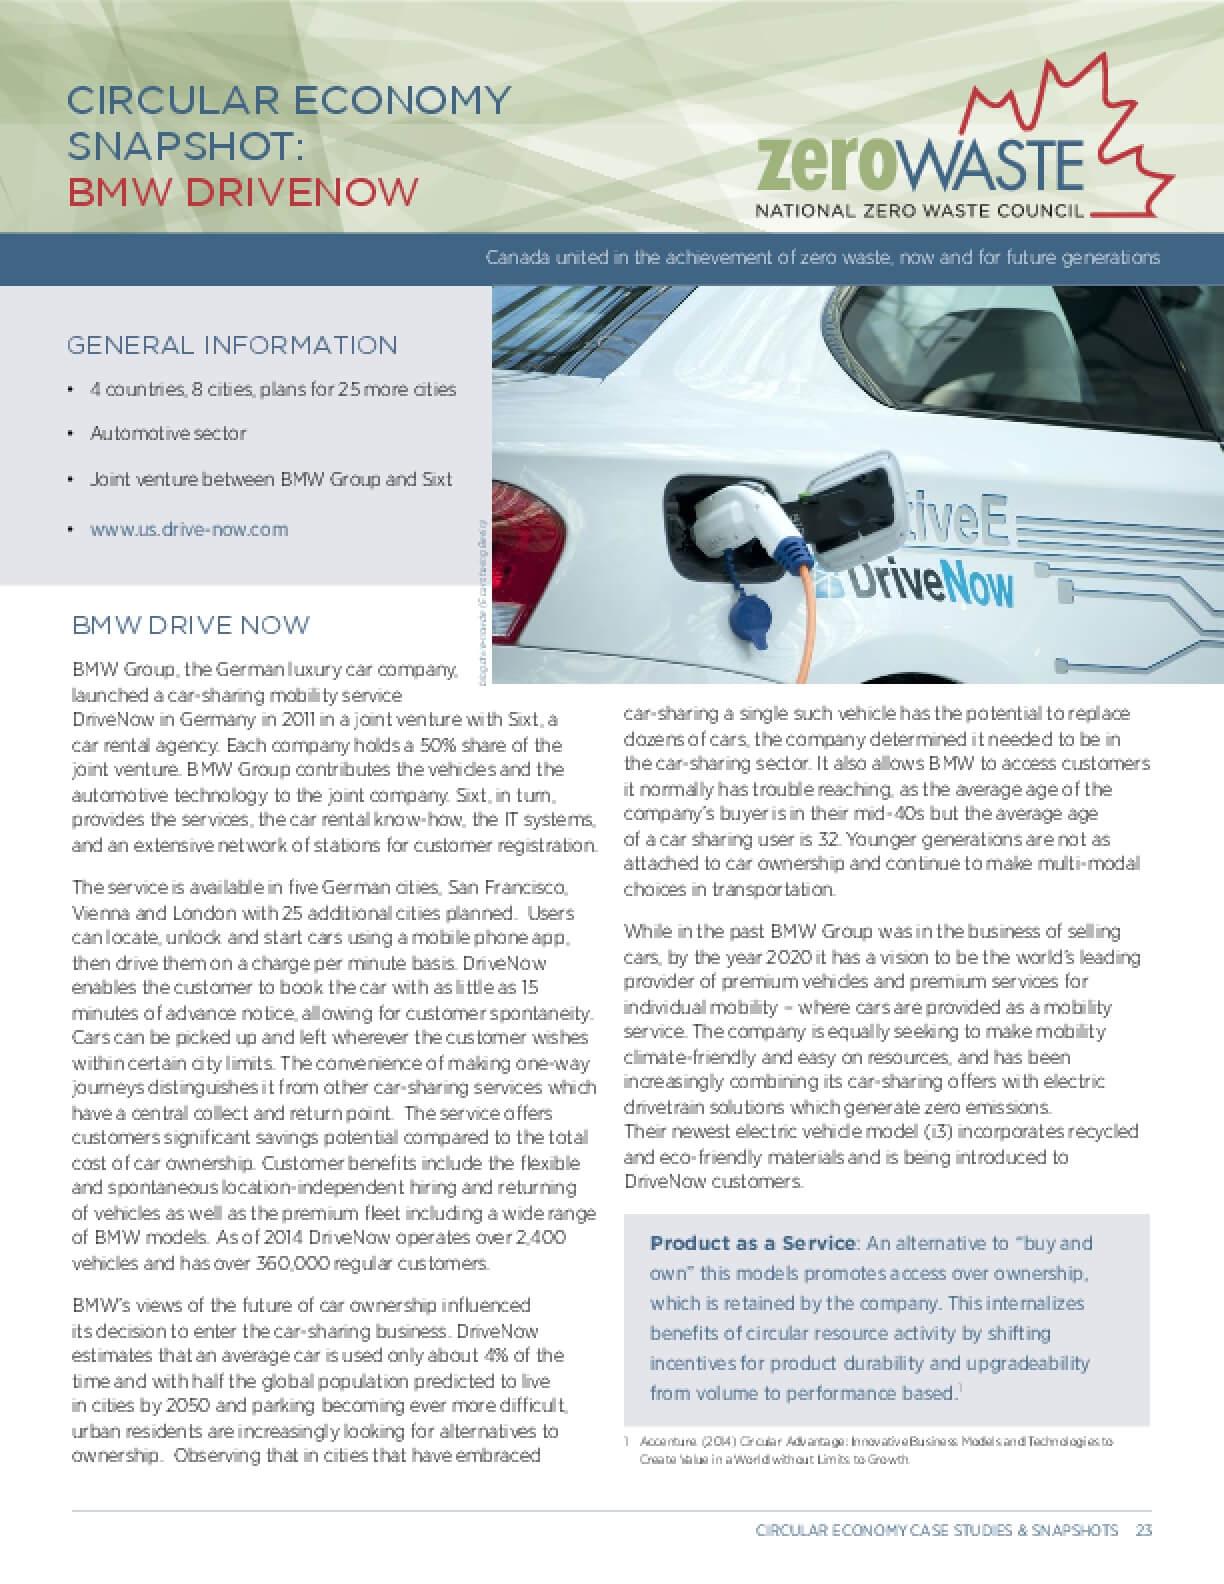 Circular Economy Snapshot: BMW Drivenow